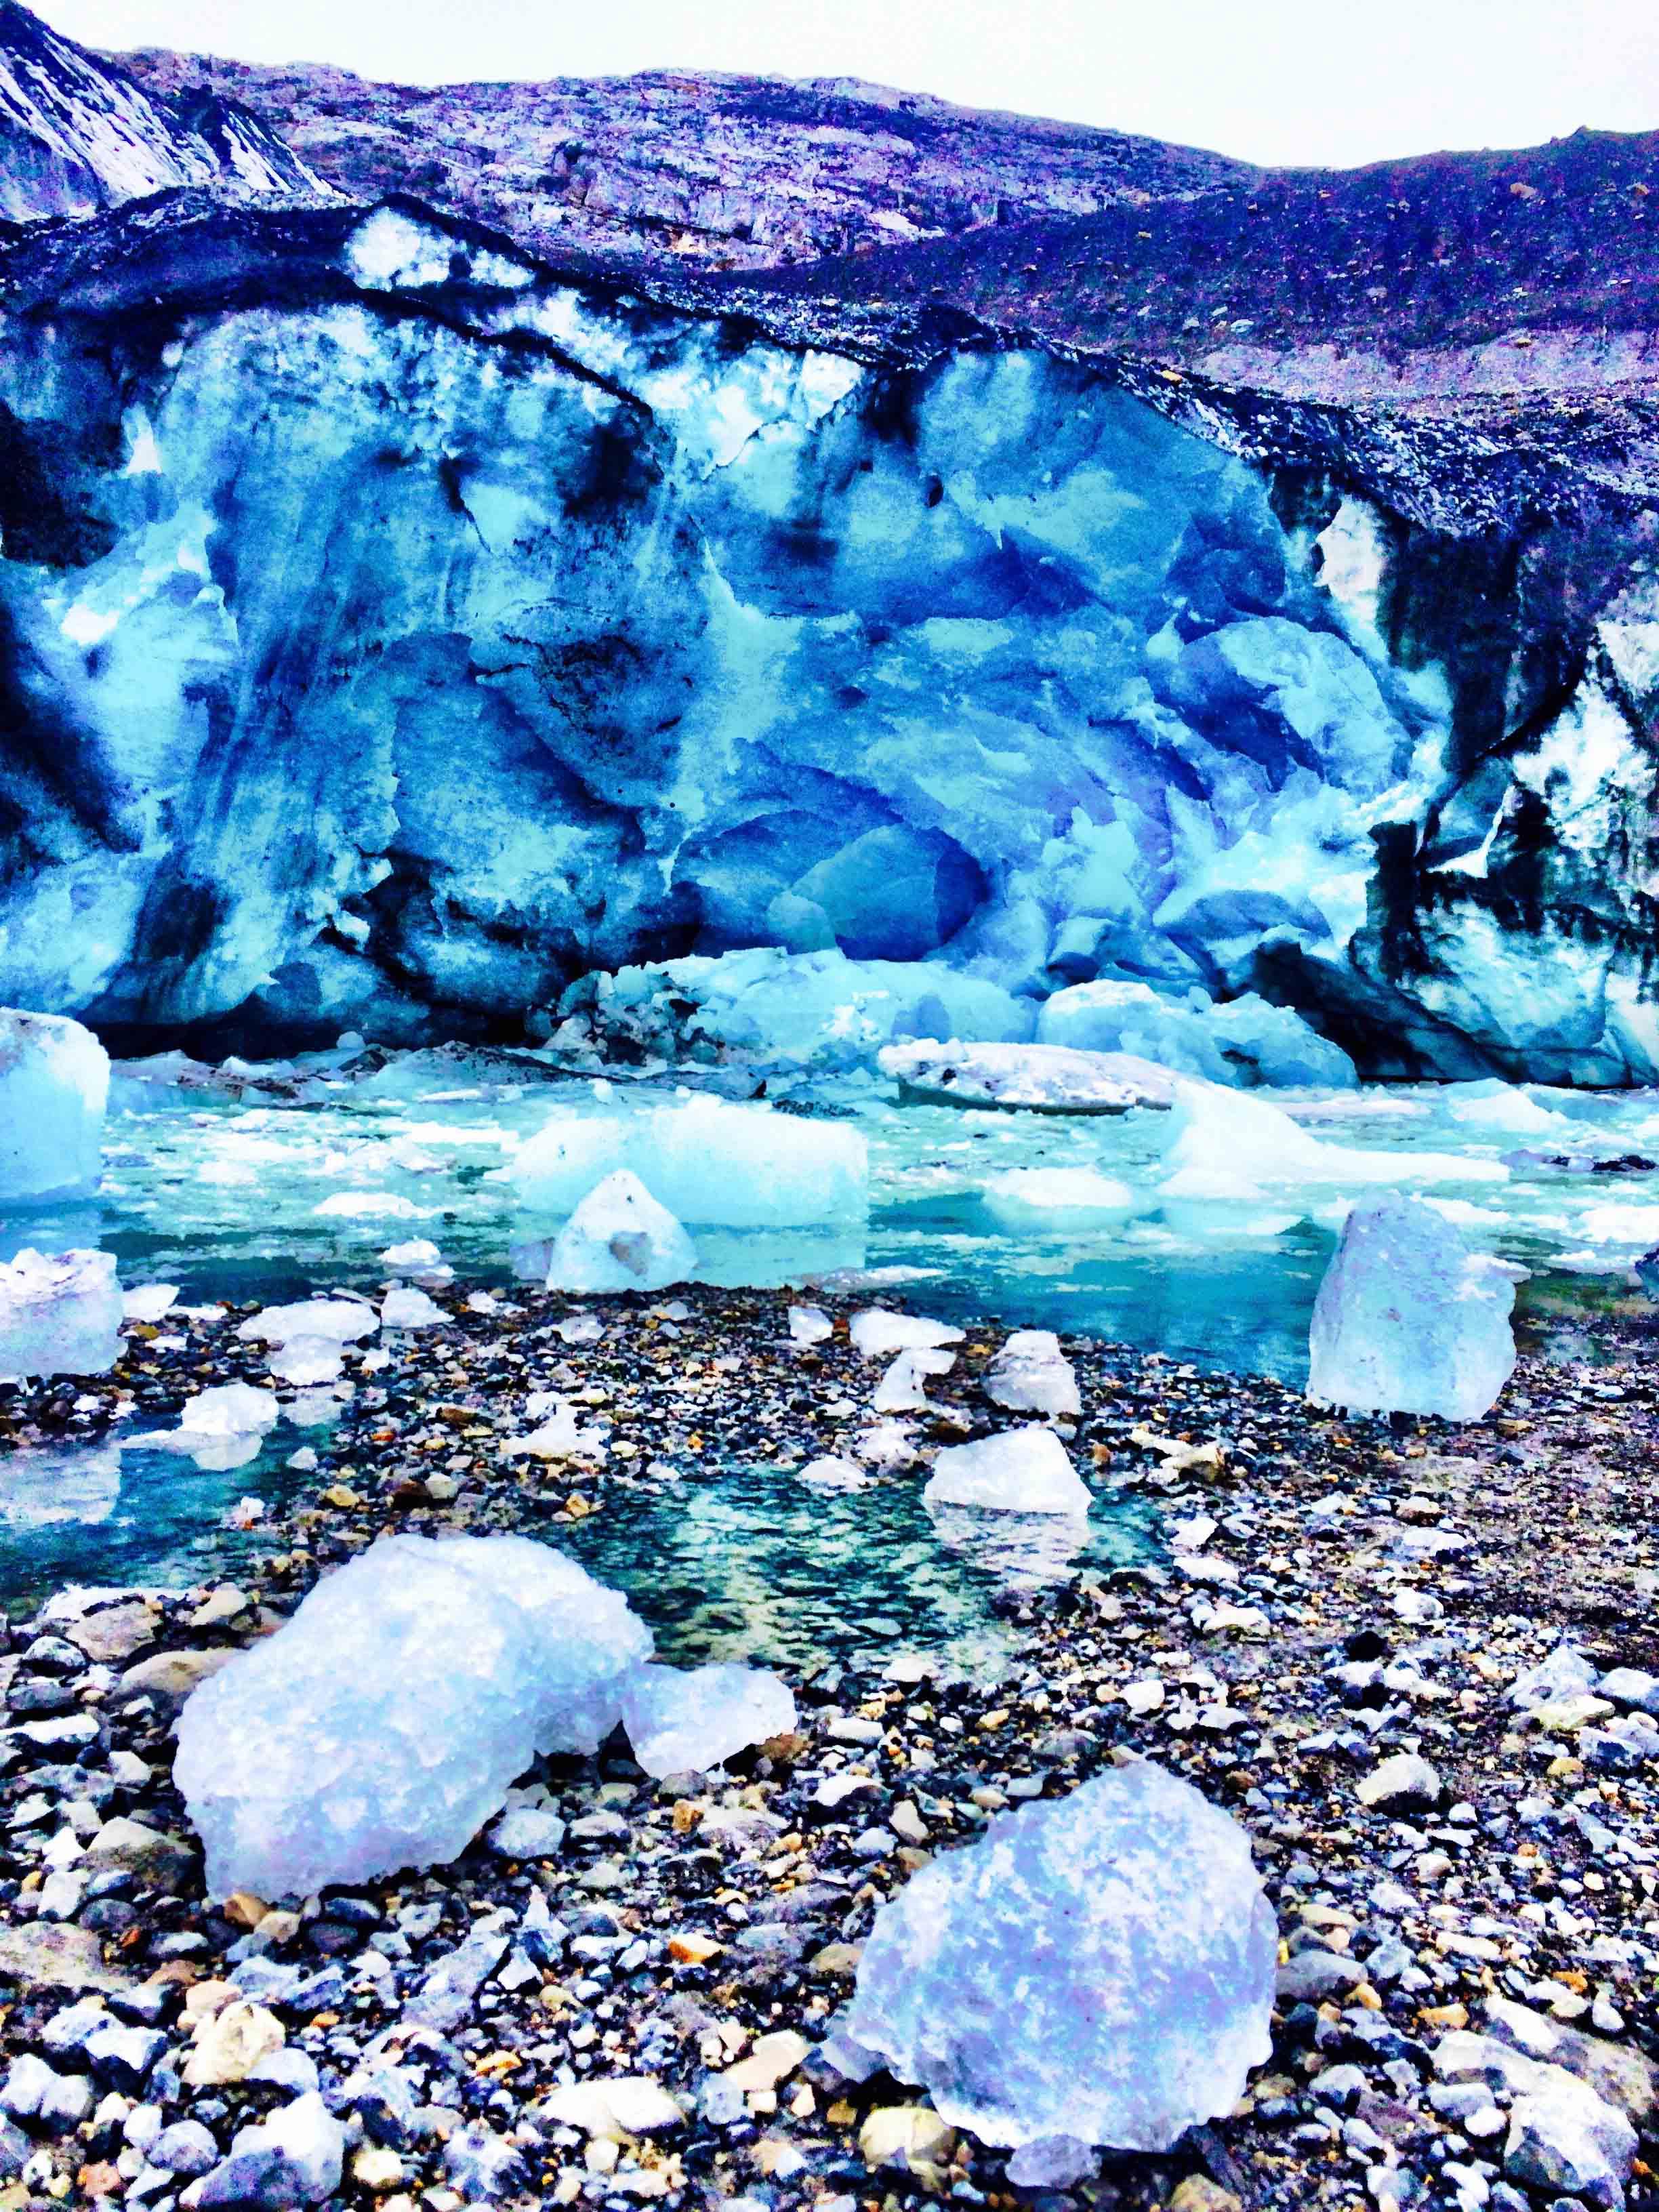 Columbia Icefield, Jasper National Park, Canada, September 2015